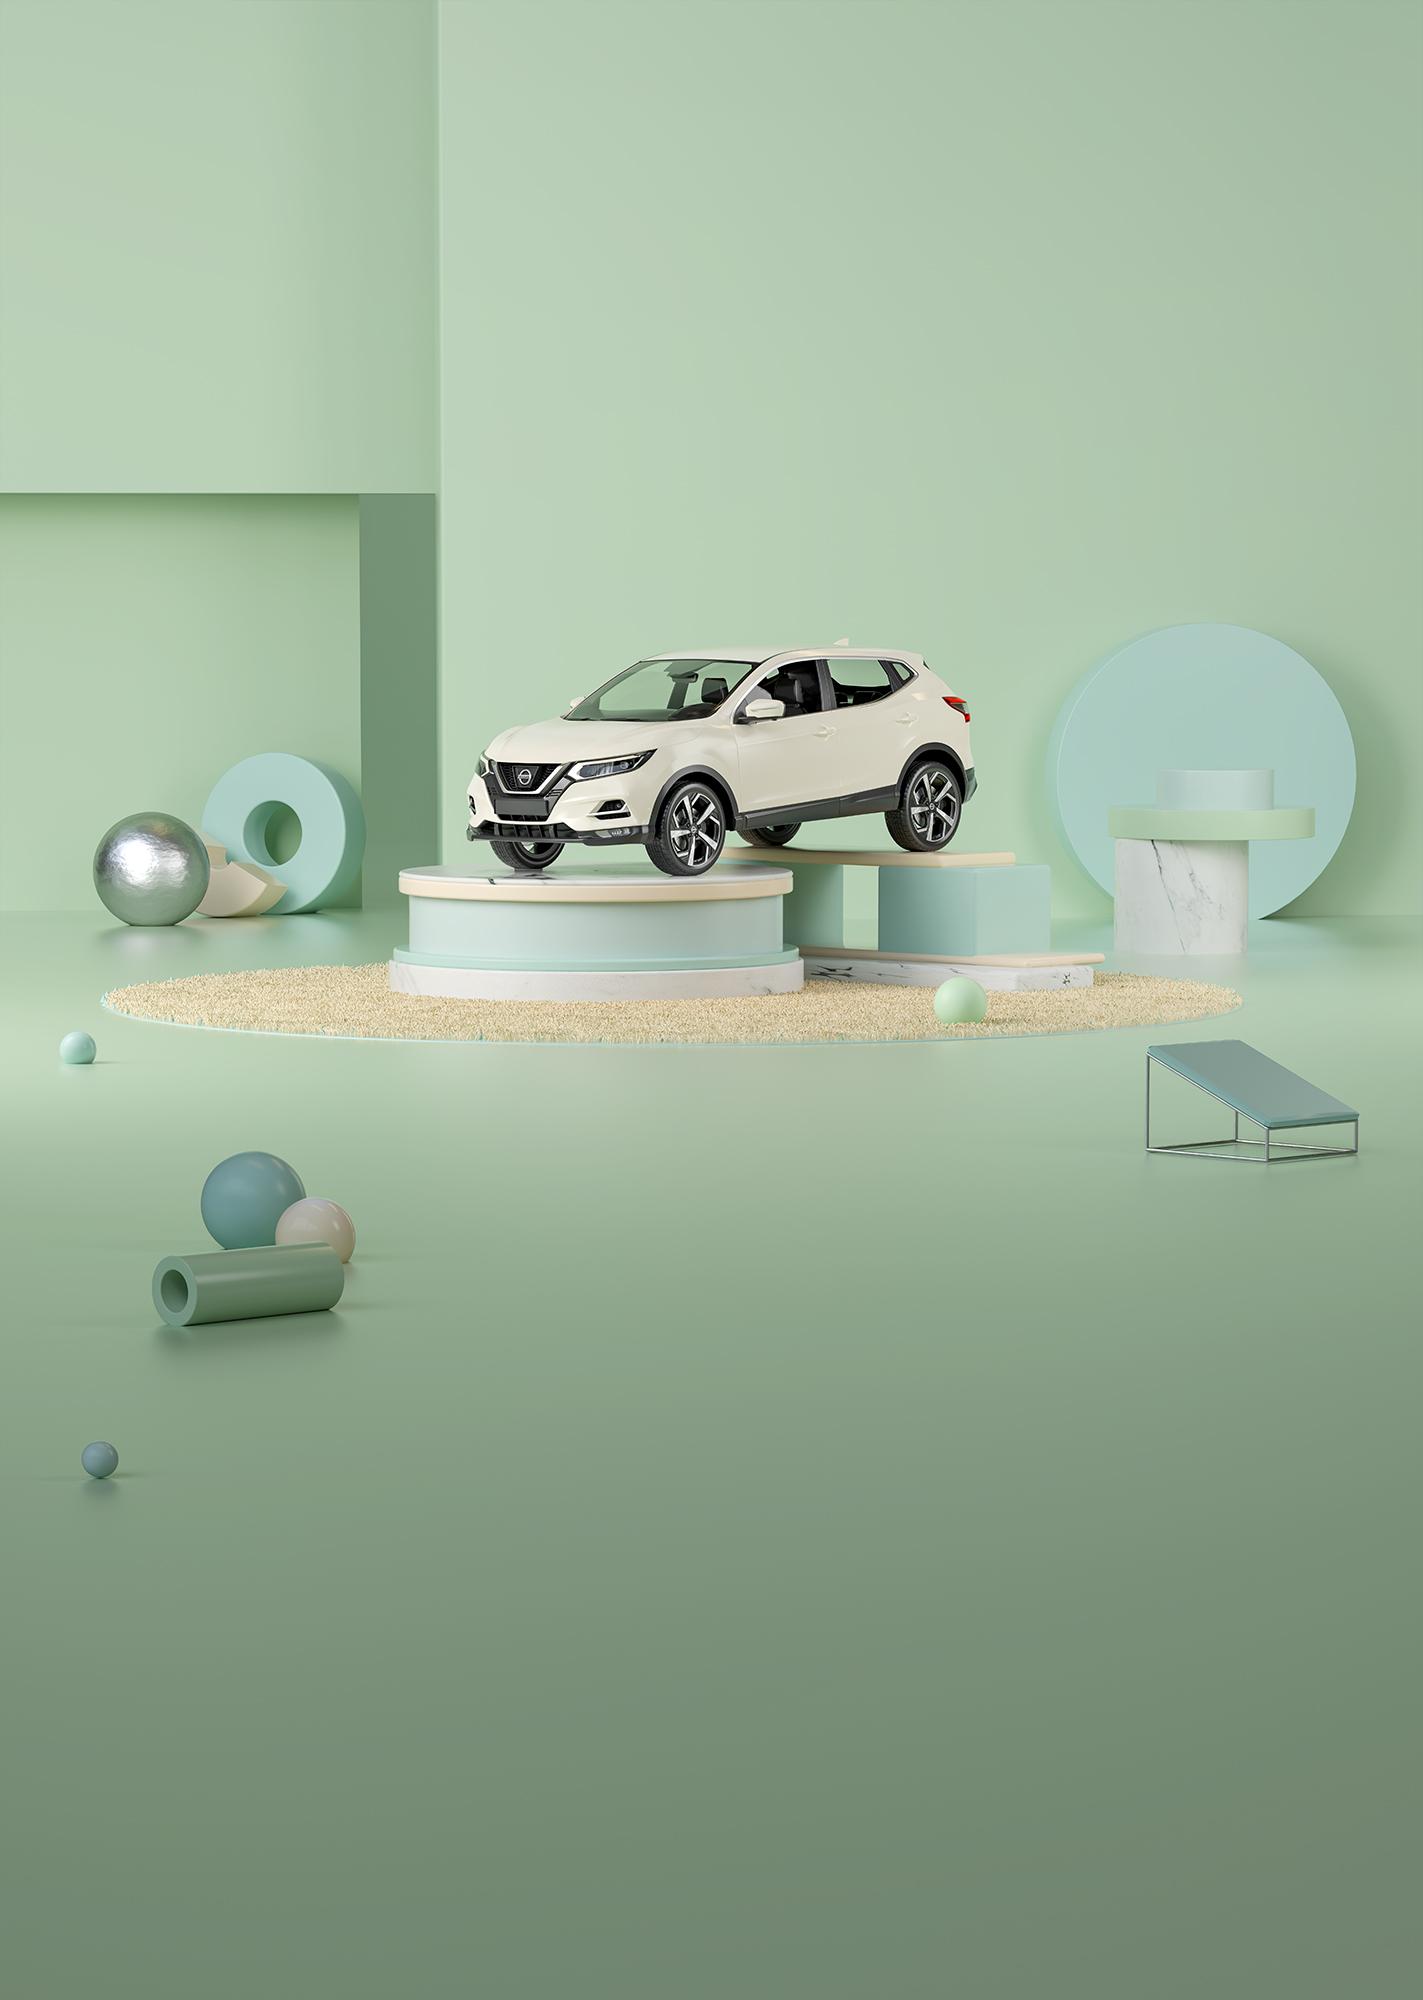 Cars_bankia_Toyota_Yaris_02__1.jpg